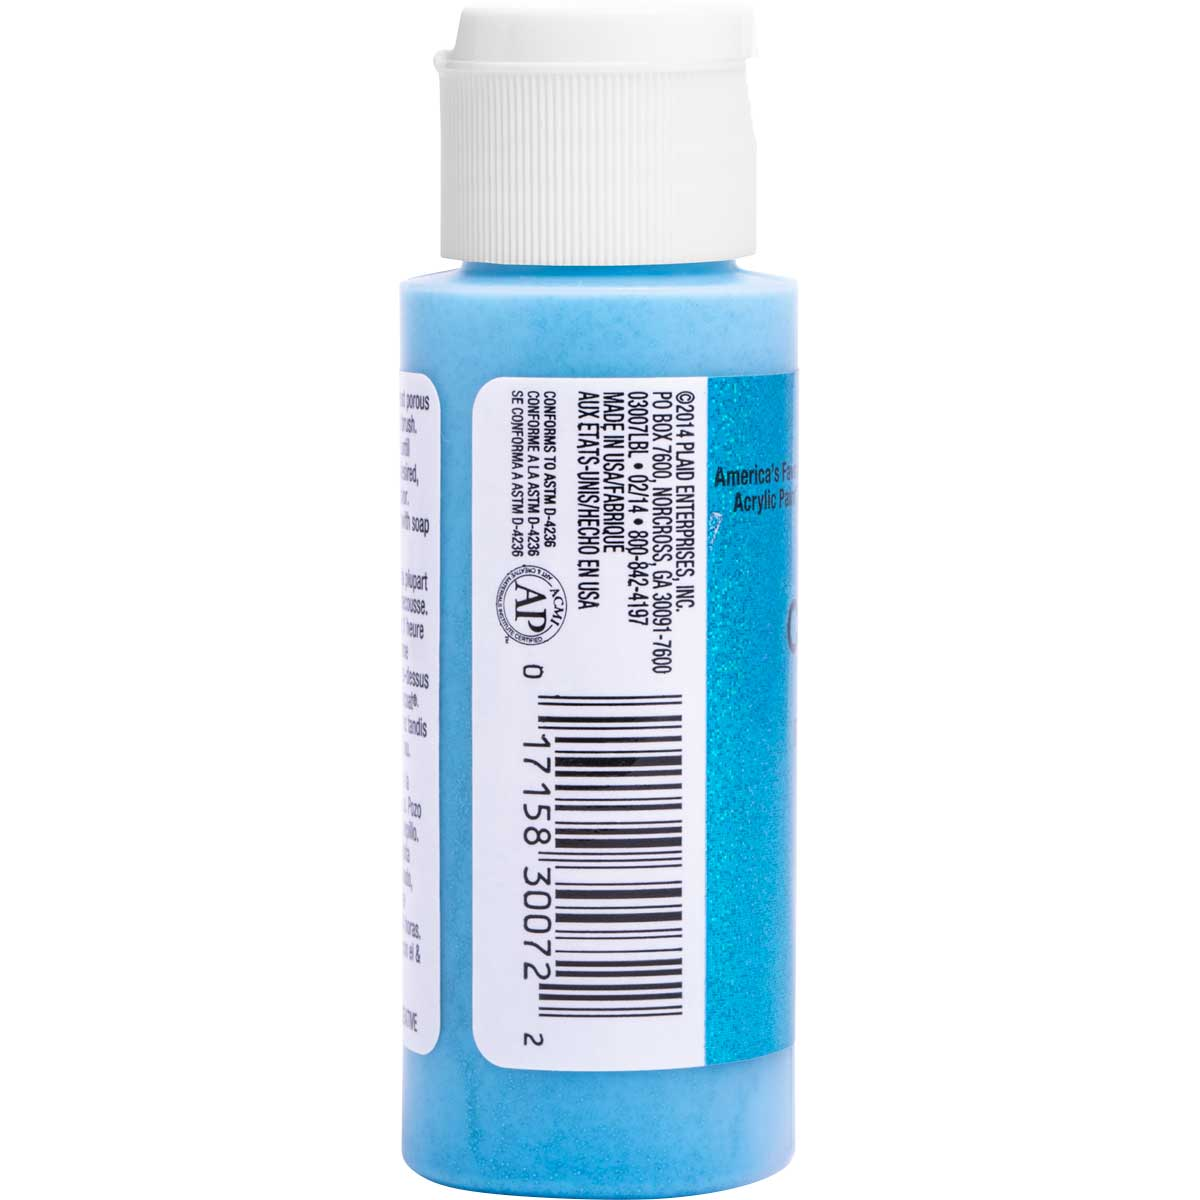 Delta Ceramcoat ® Acrylic Paint - Glitter Blue, 2 oz. - 03007